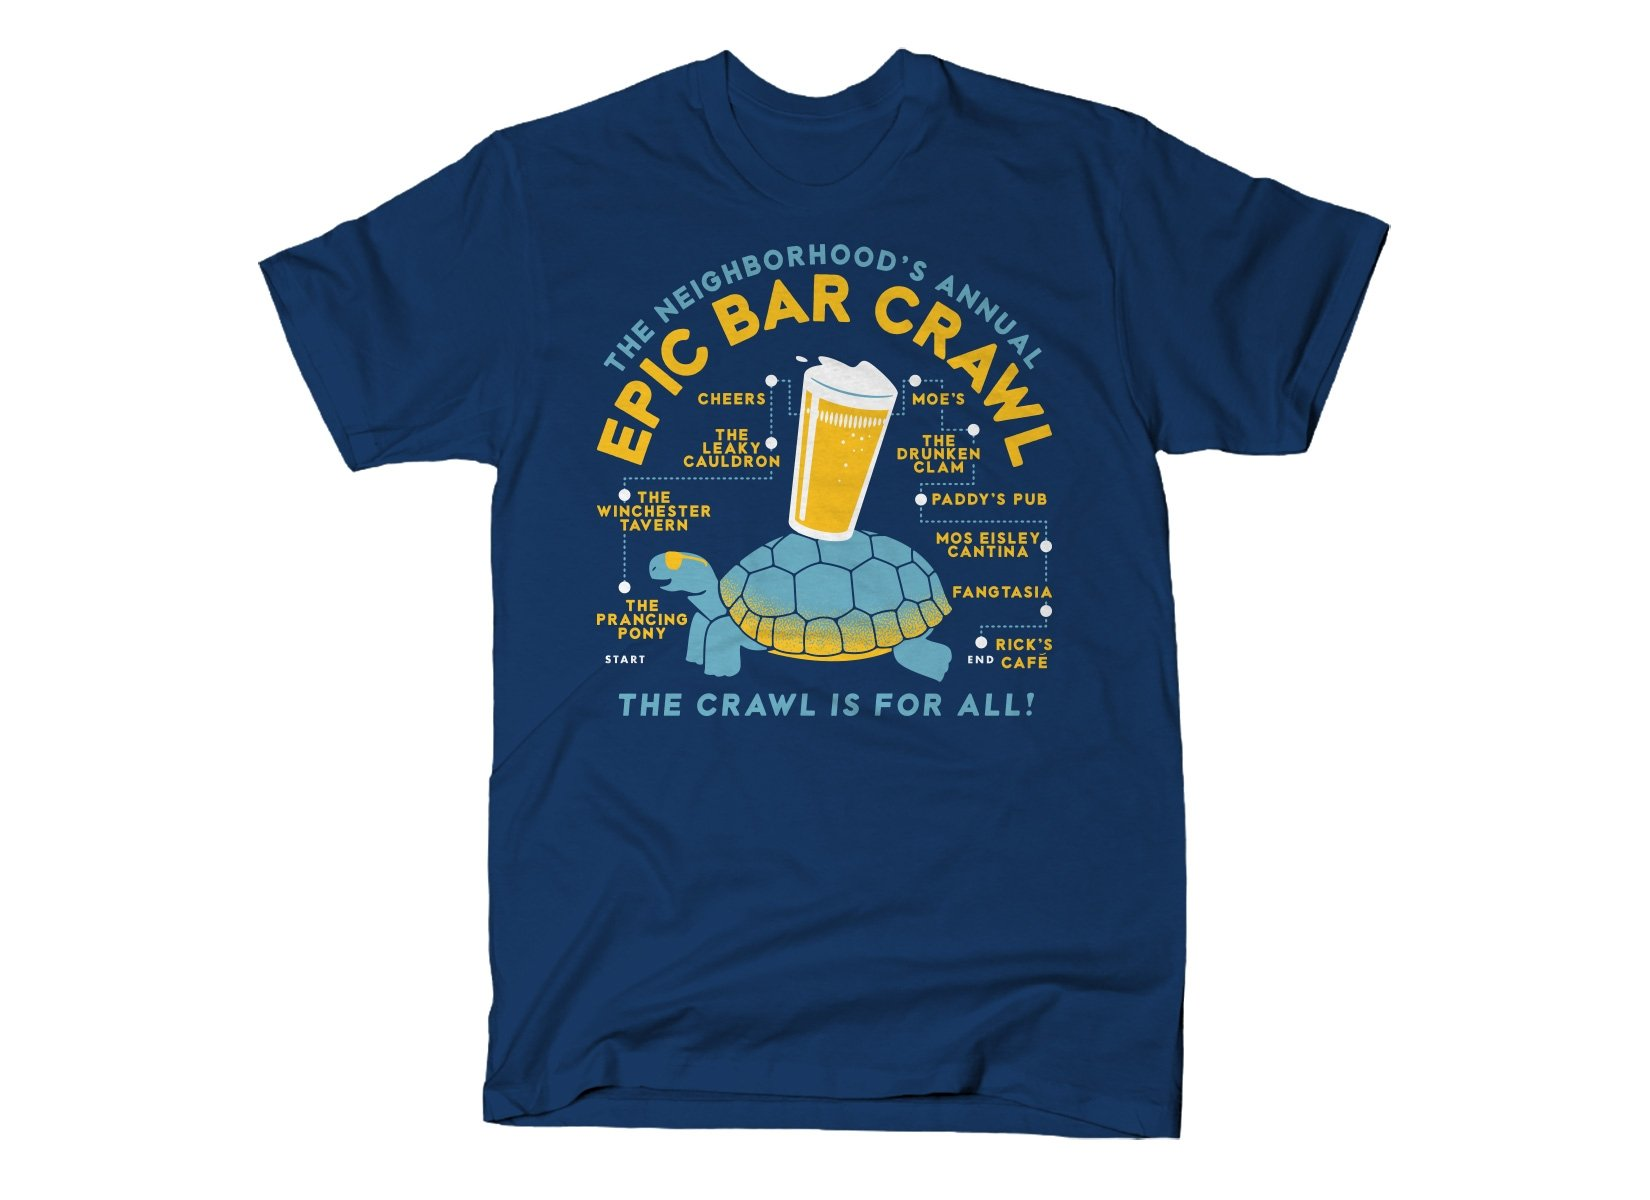 Epic Bar Crawl on Mens T-Shirt